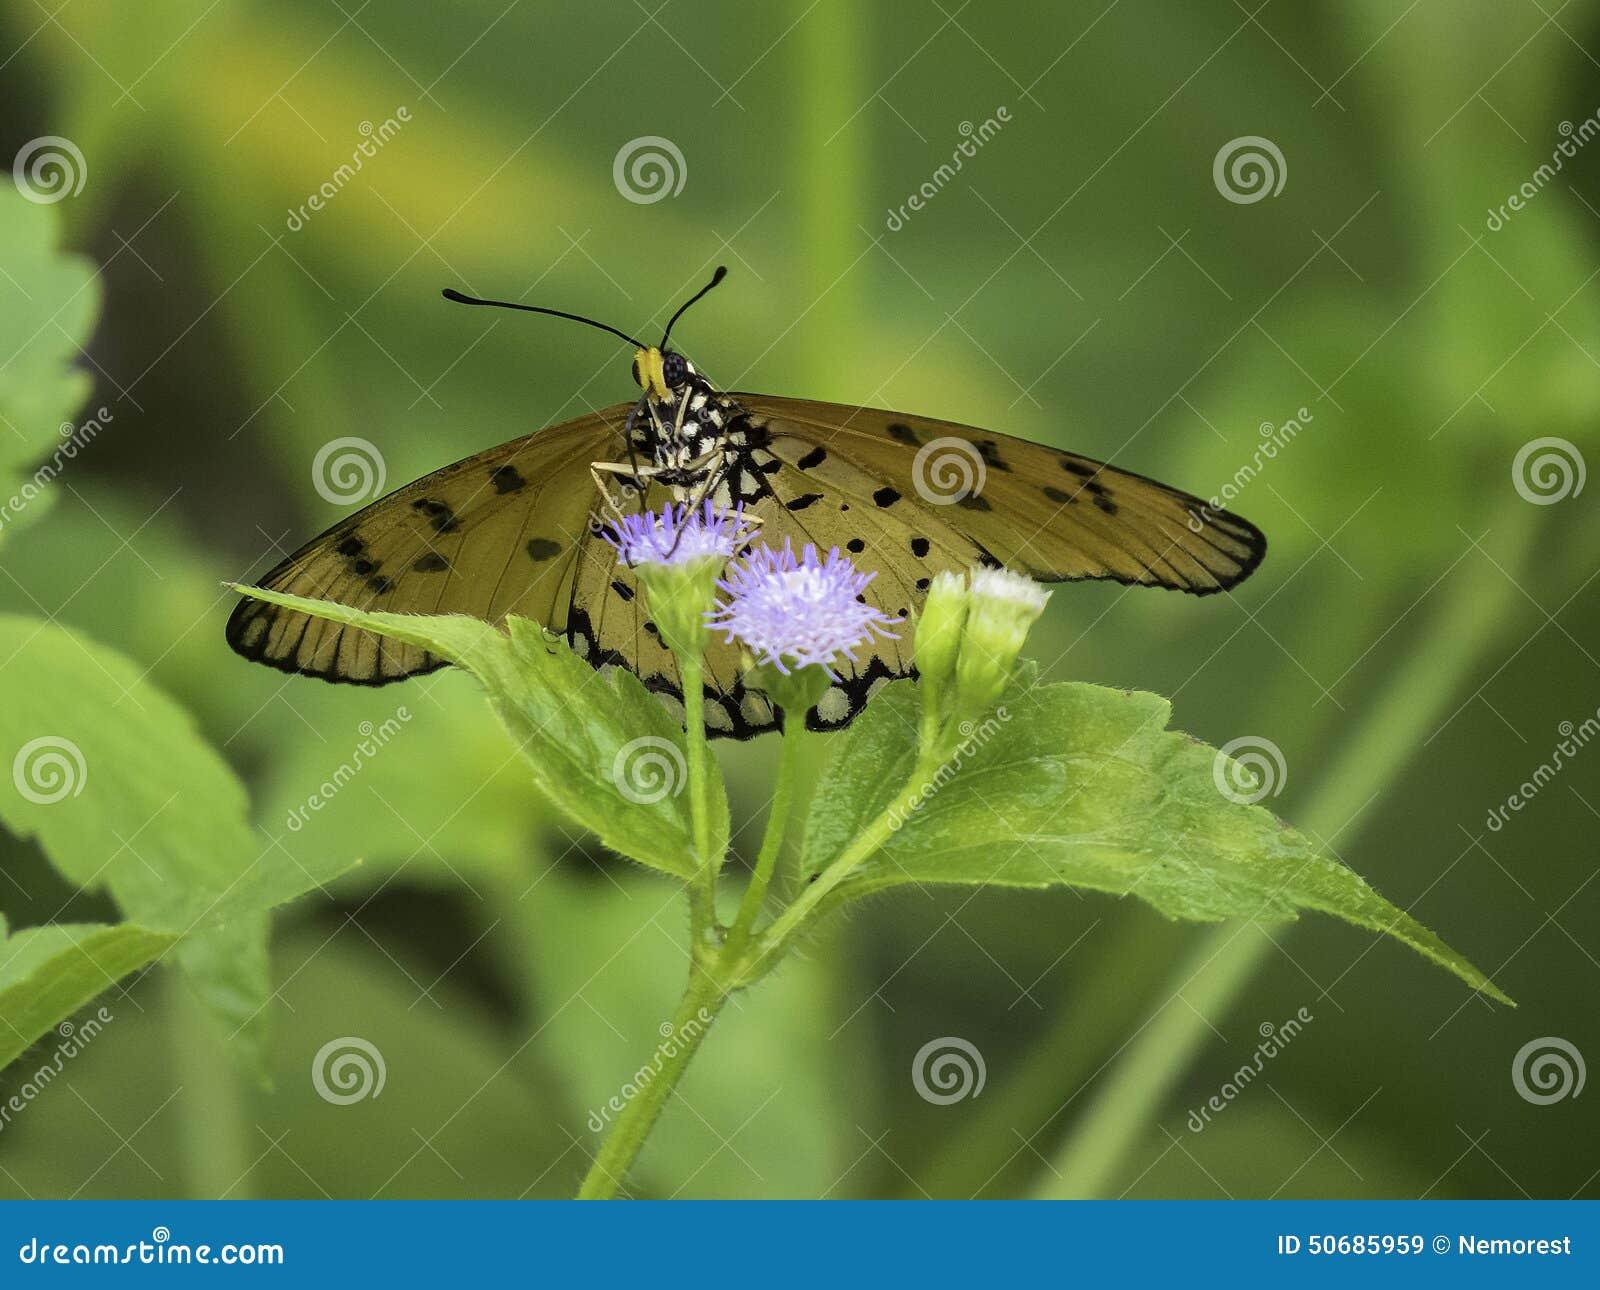 Download 蝴蝶 库存图片. 图片 包括有 热带, 扩大化, 蝴蝶, 宏指令, 栖所, 飞行, 触手, 节肢动物, 放大 - 50685959